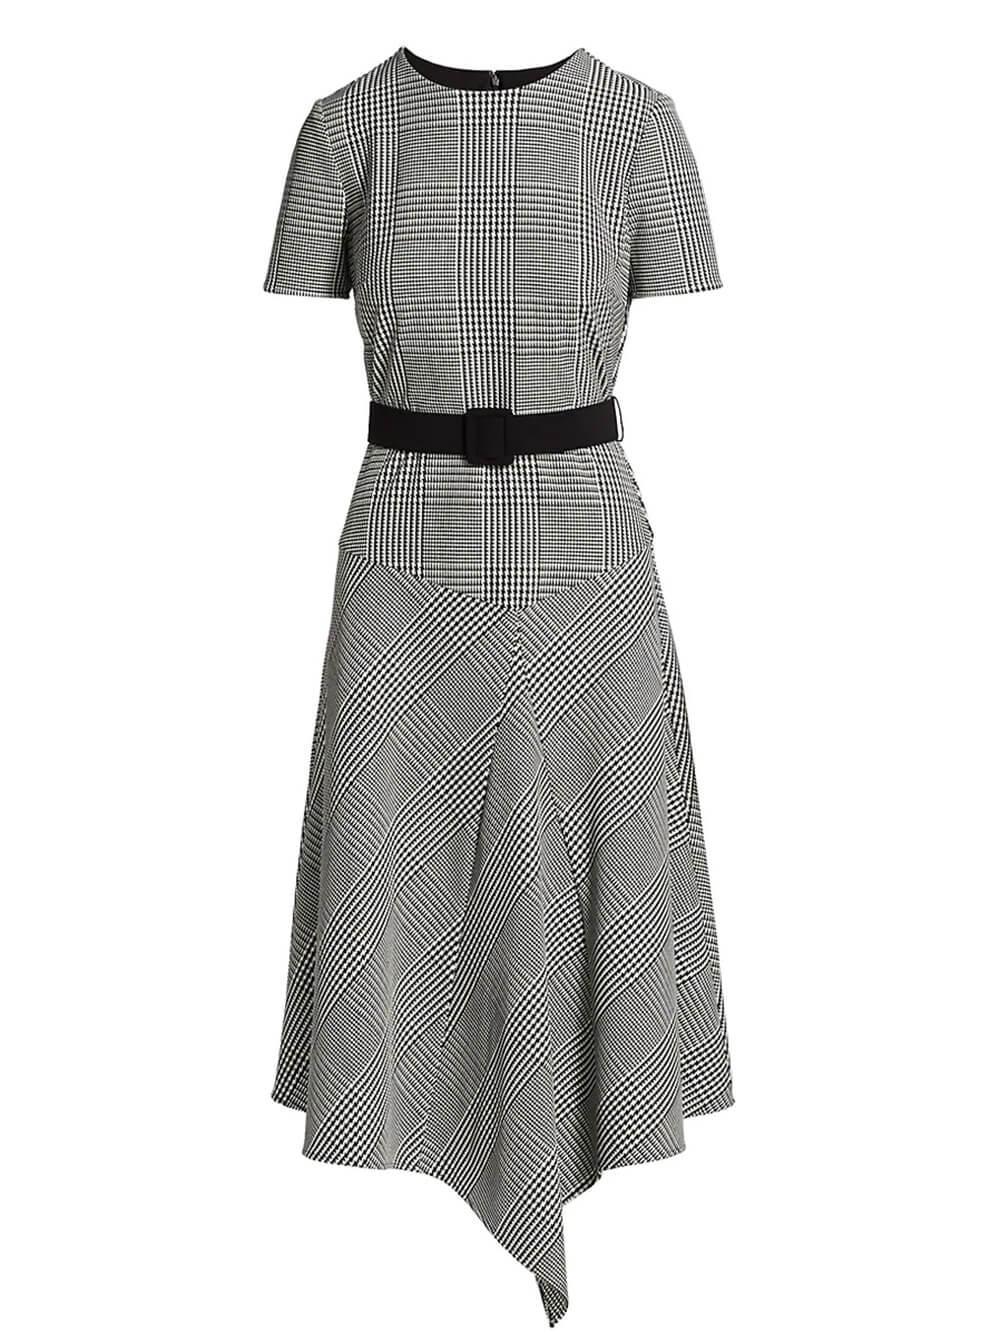 Glenn Plaid Asymmetrical Dress Item # BSD4653